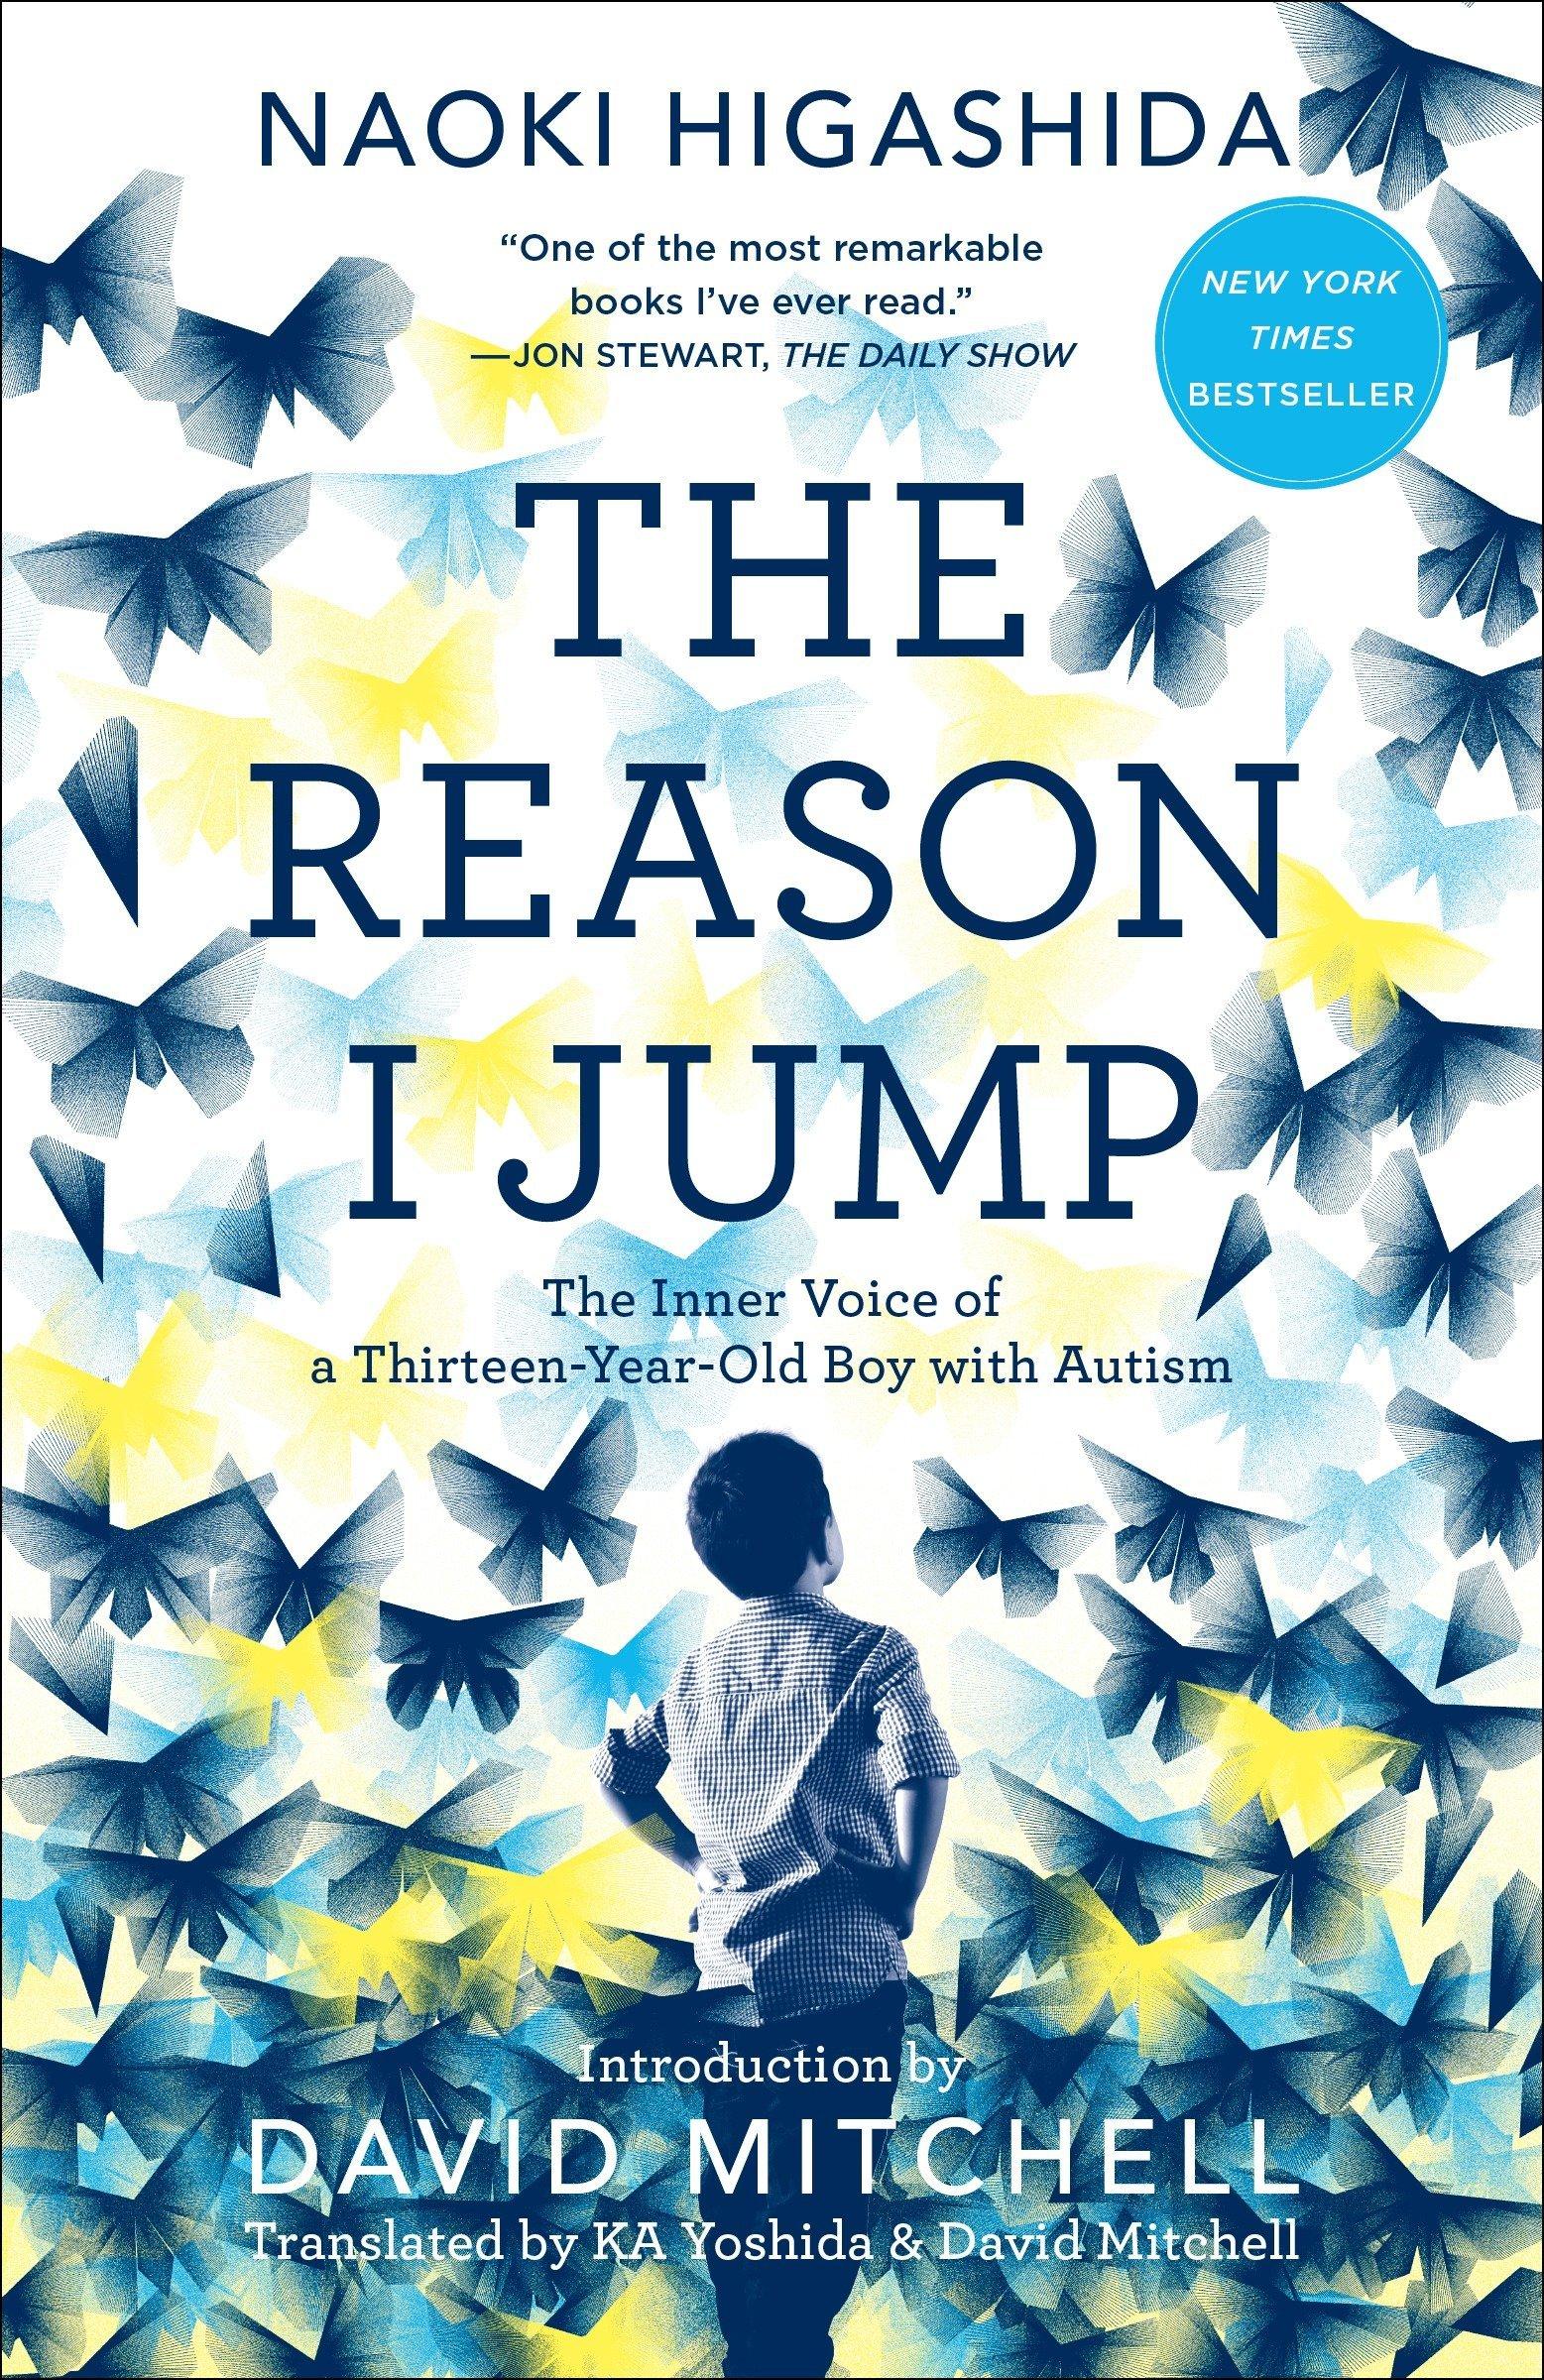 The Reason I Jump: The Inner Voice of a Thirteen-Year-Old Boy with Autism:  Higashida, Naoki, Yoshida, KA, Mitchell, David: 9780812985153: Amazon.com:  Books